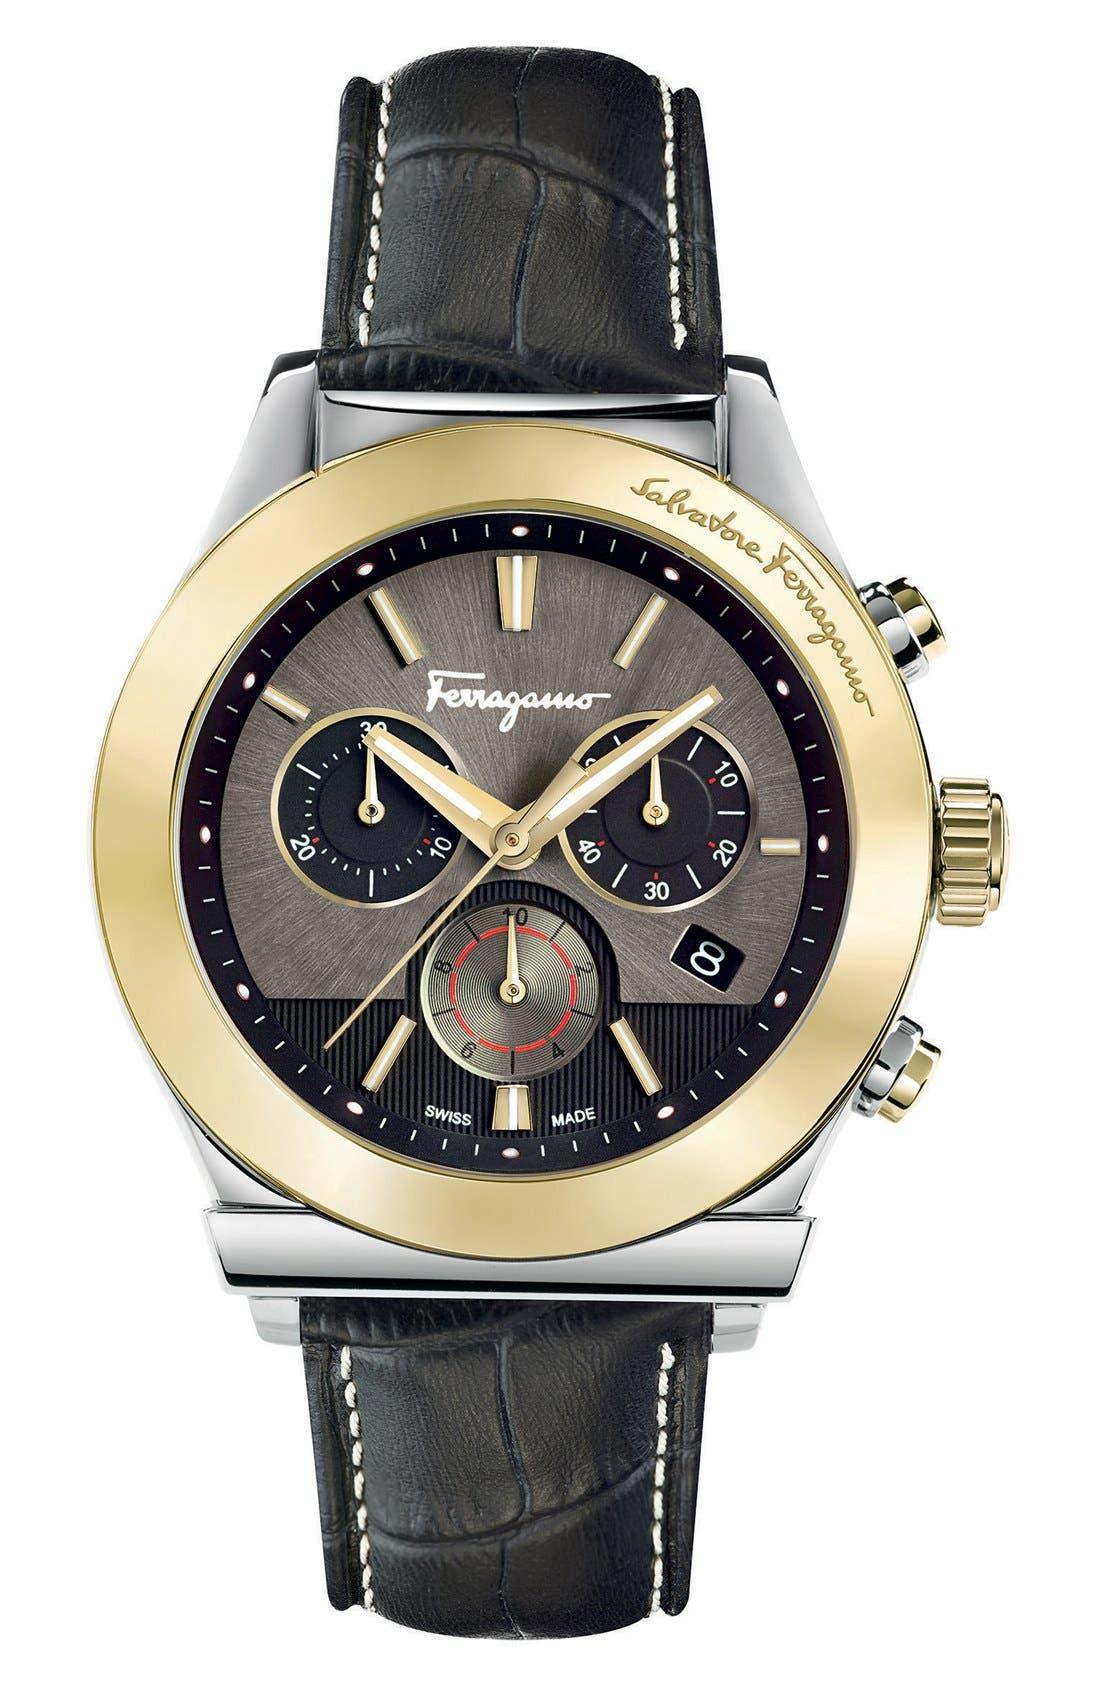 Alternate Image 1 Selected - Salvatore Ferragamo '1898' Chronograph Leather Strap Watch, 42mm